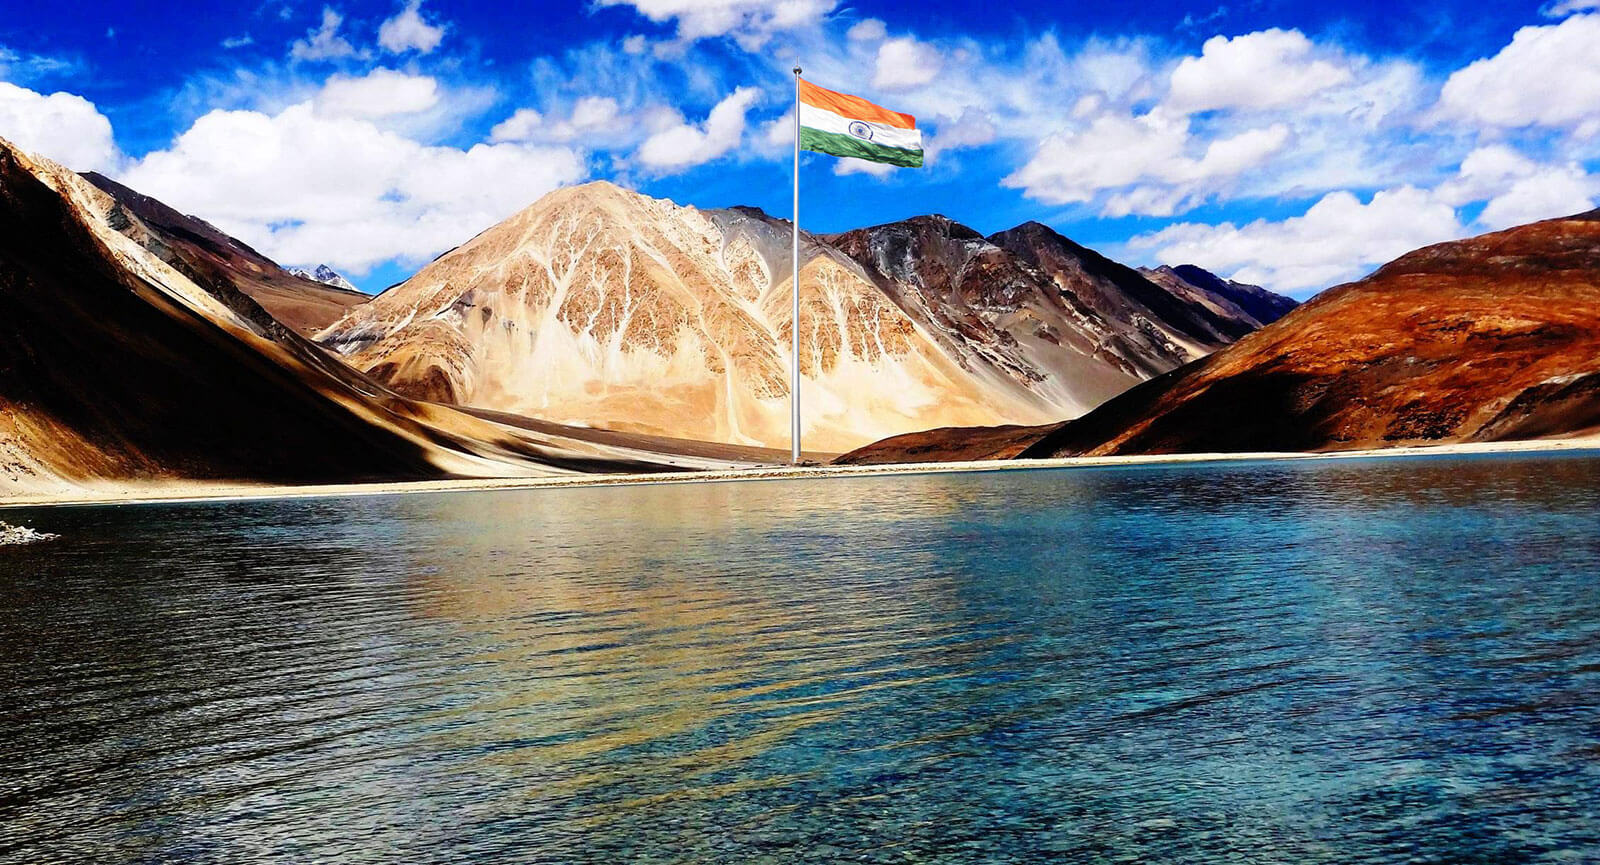 giant indian flag at ladakh